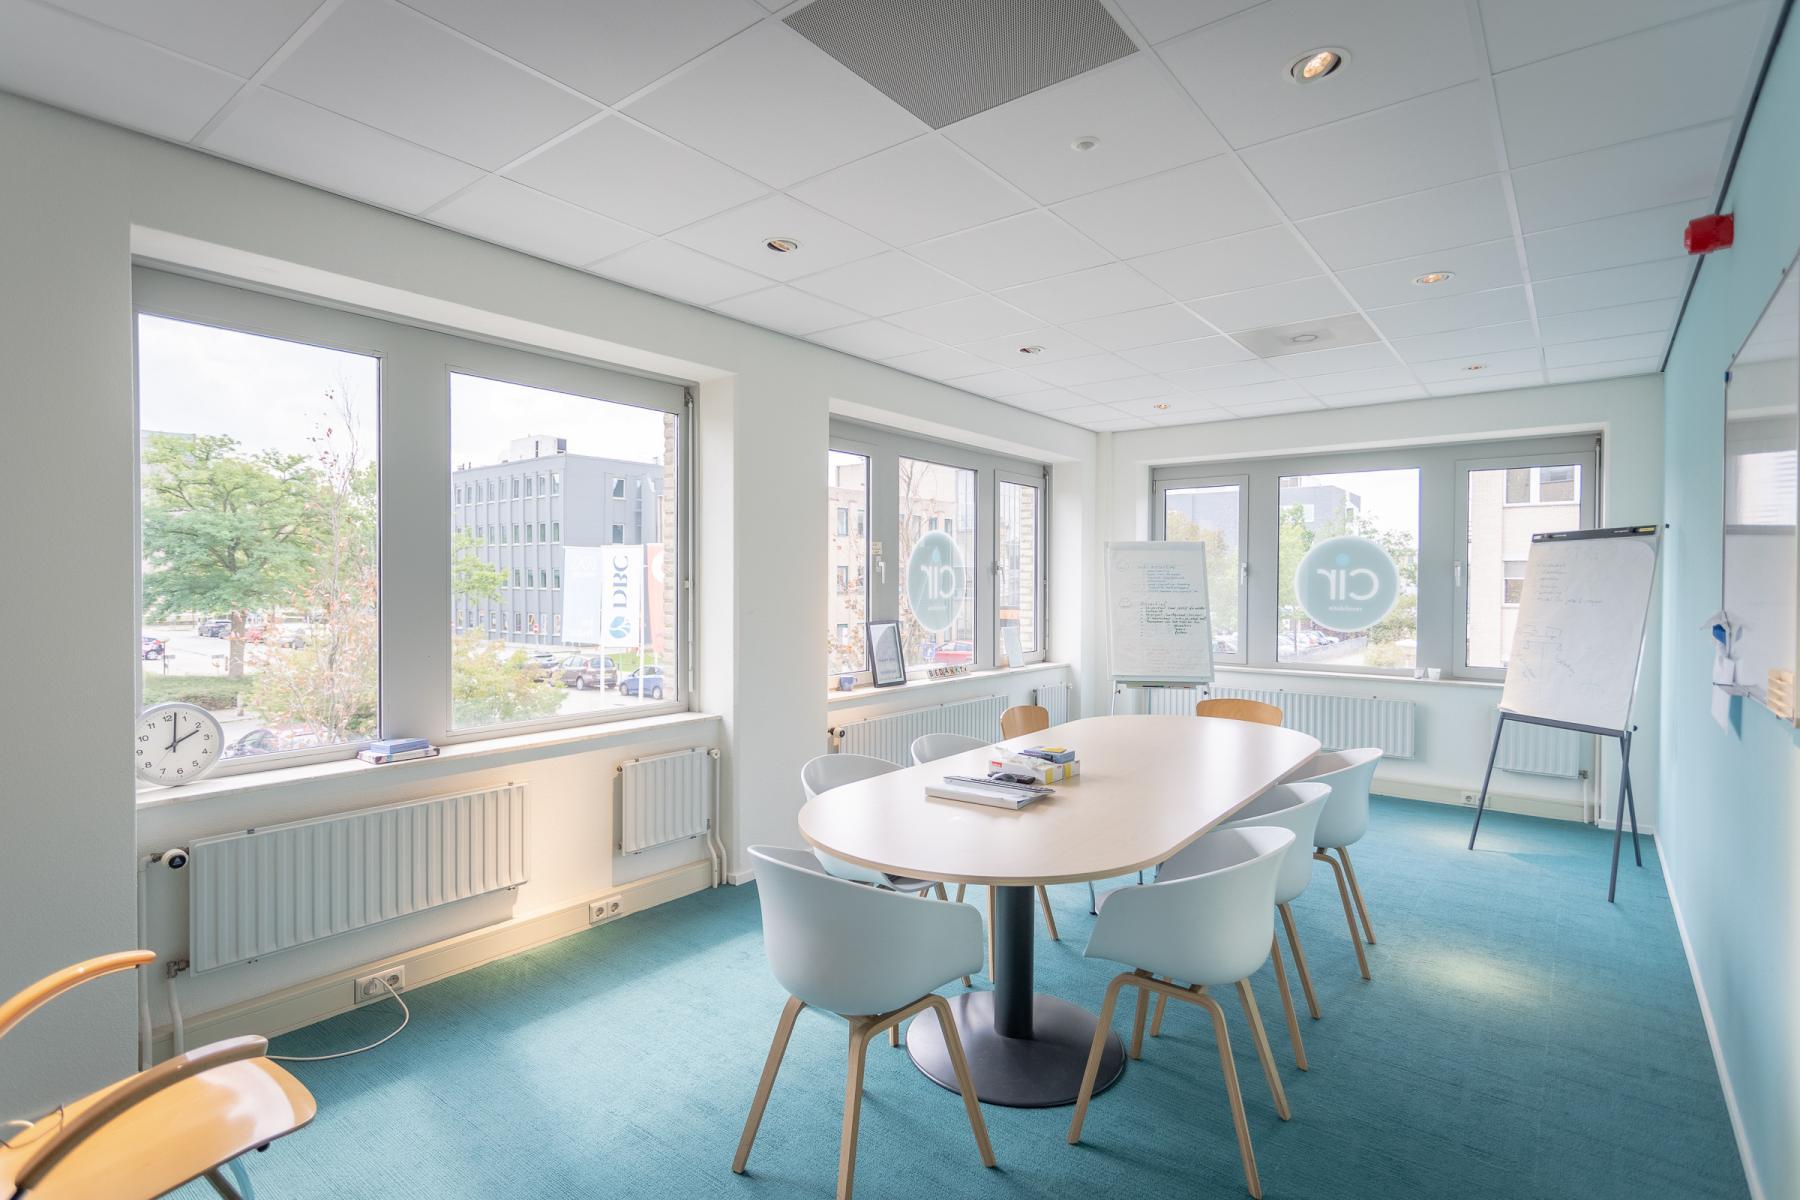 Rent office space Dokter Stolteweg 42, Zwolle (4)